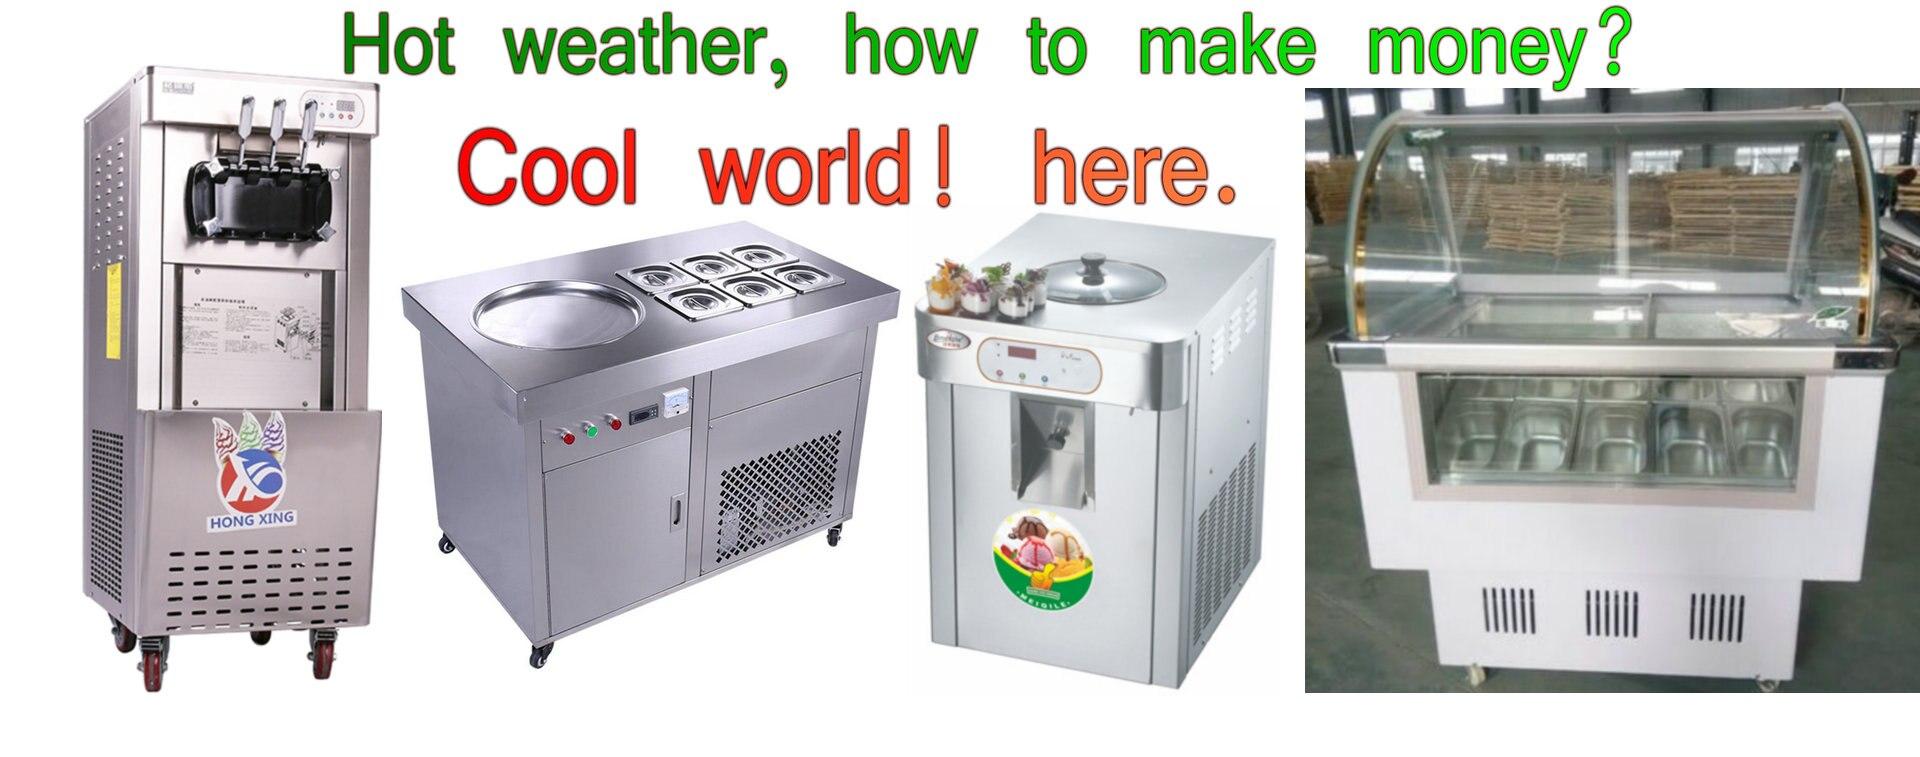 Guangzhou YueDing kitchen equipment co., LTD - Small Orders Online ...